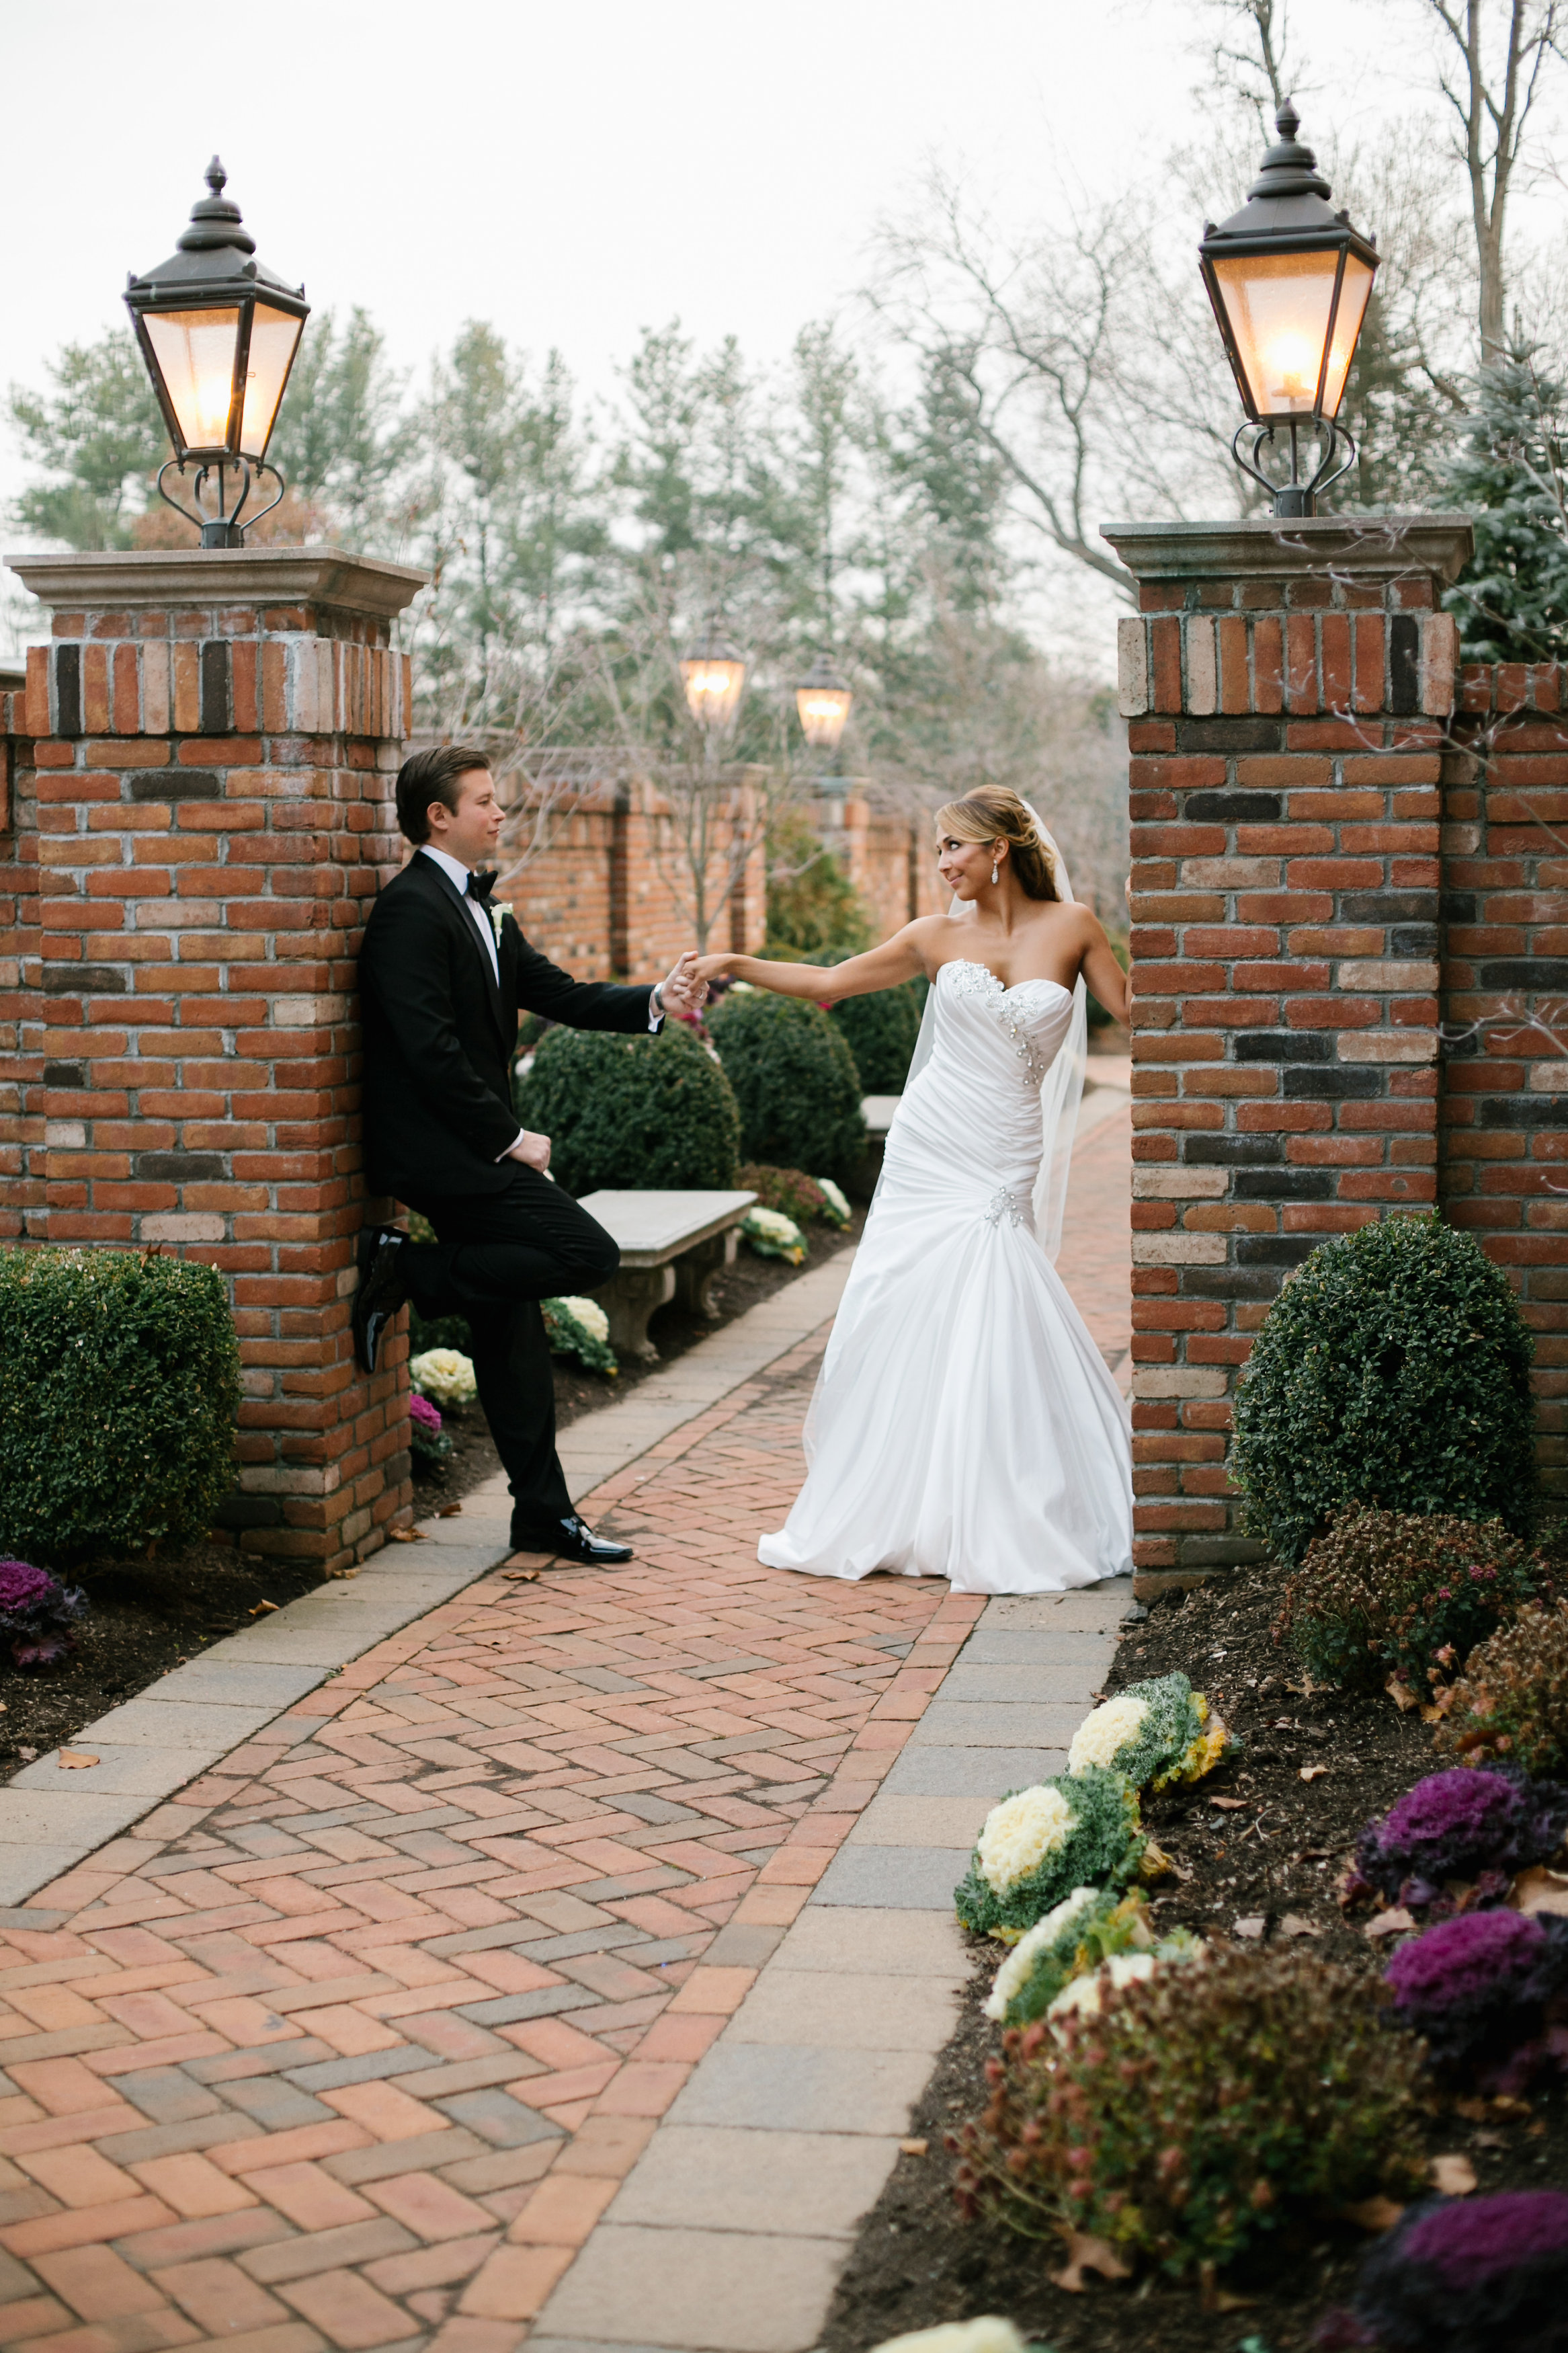 Ceci_New_York_Custom_Invitation_ New_Jersey_Wedding_Luxury_Personalized_Ceci_Style_Bride_Foil_Stamping34.jpg